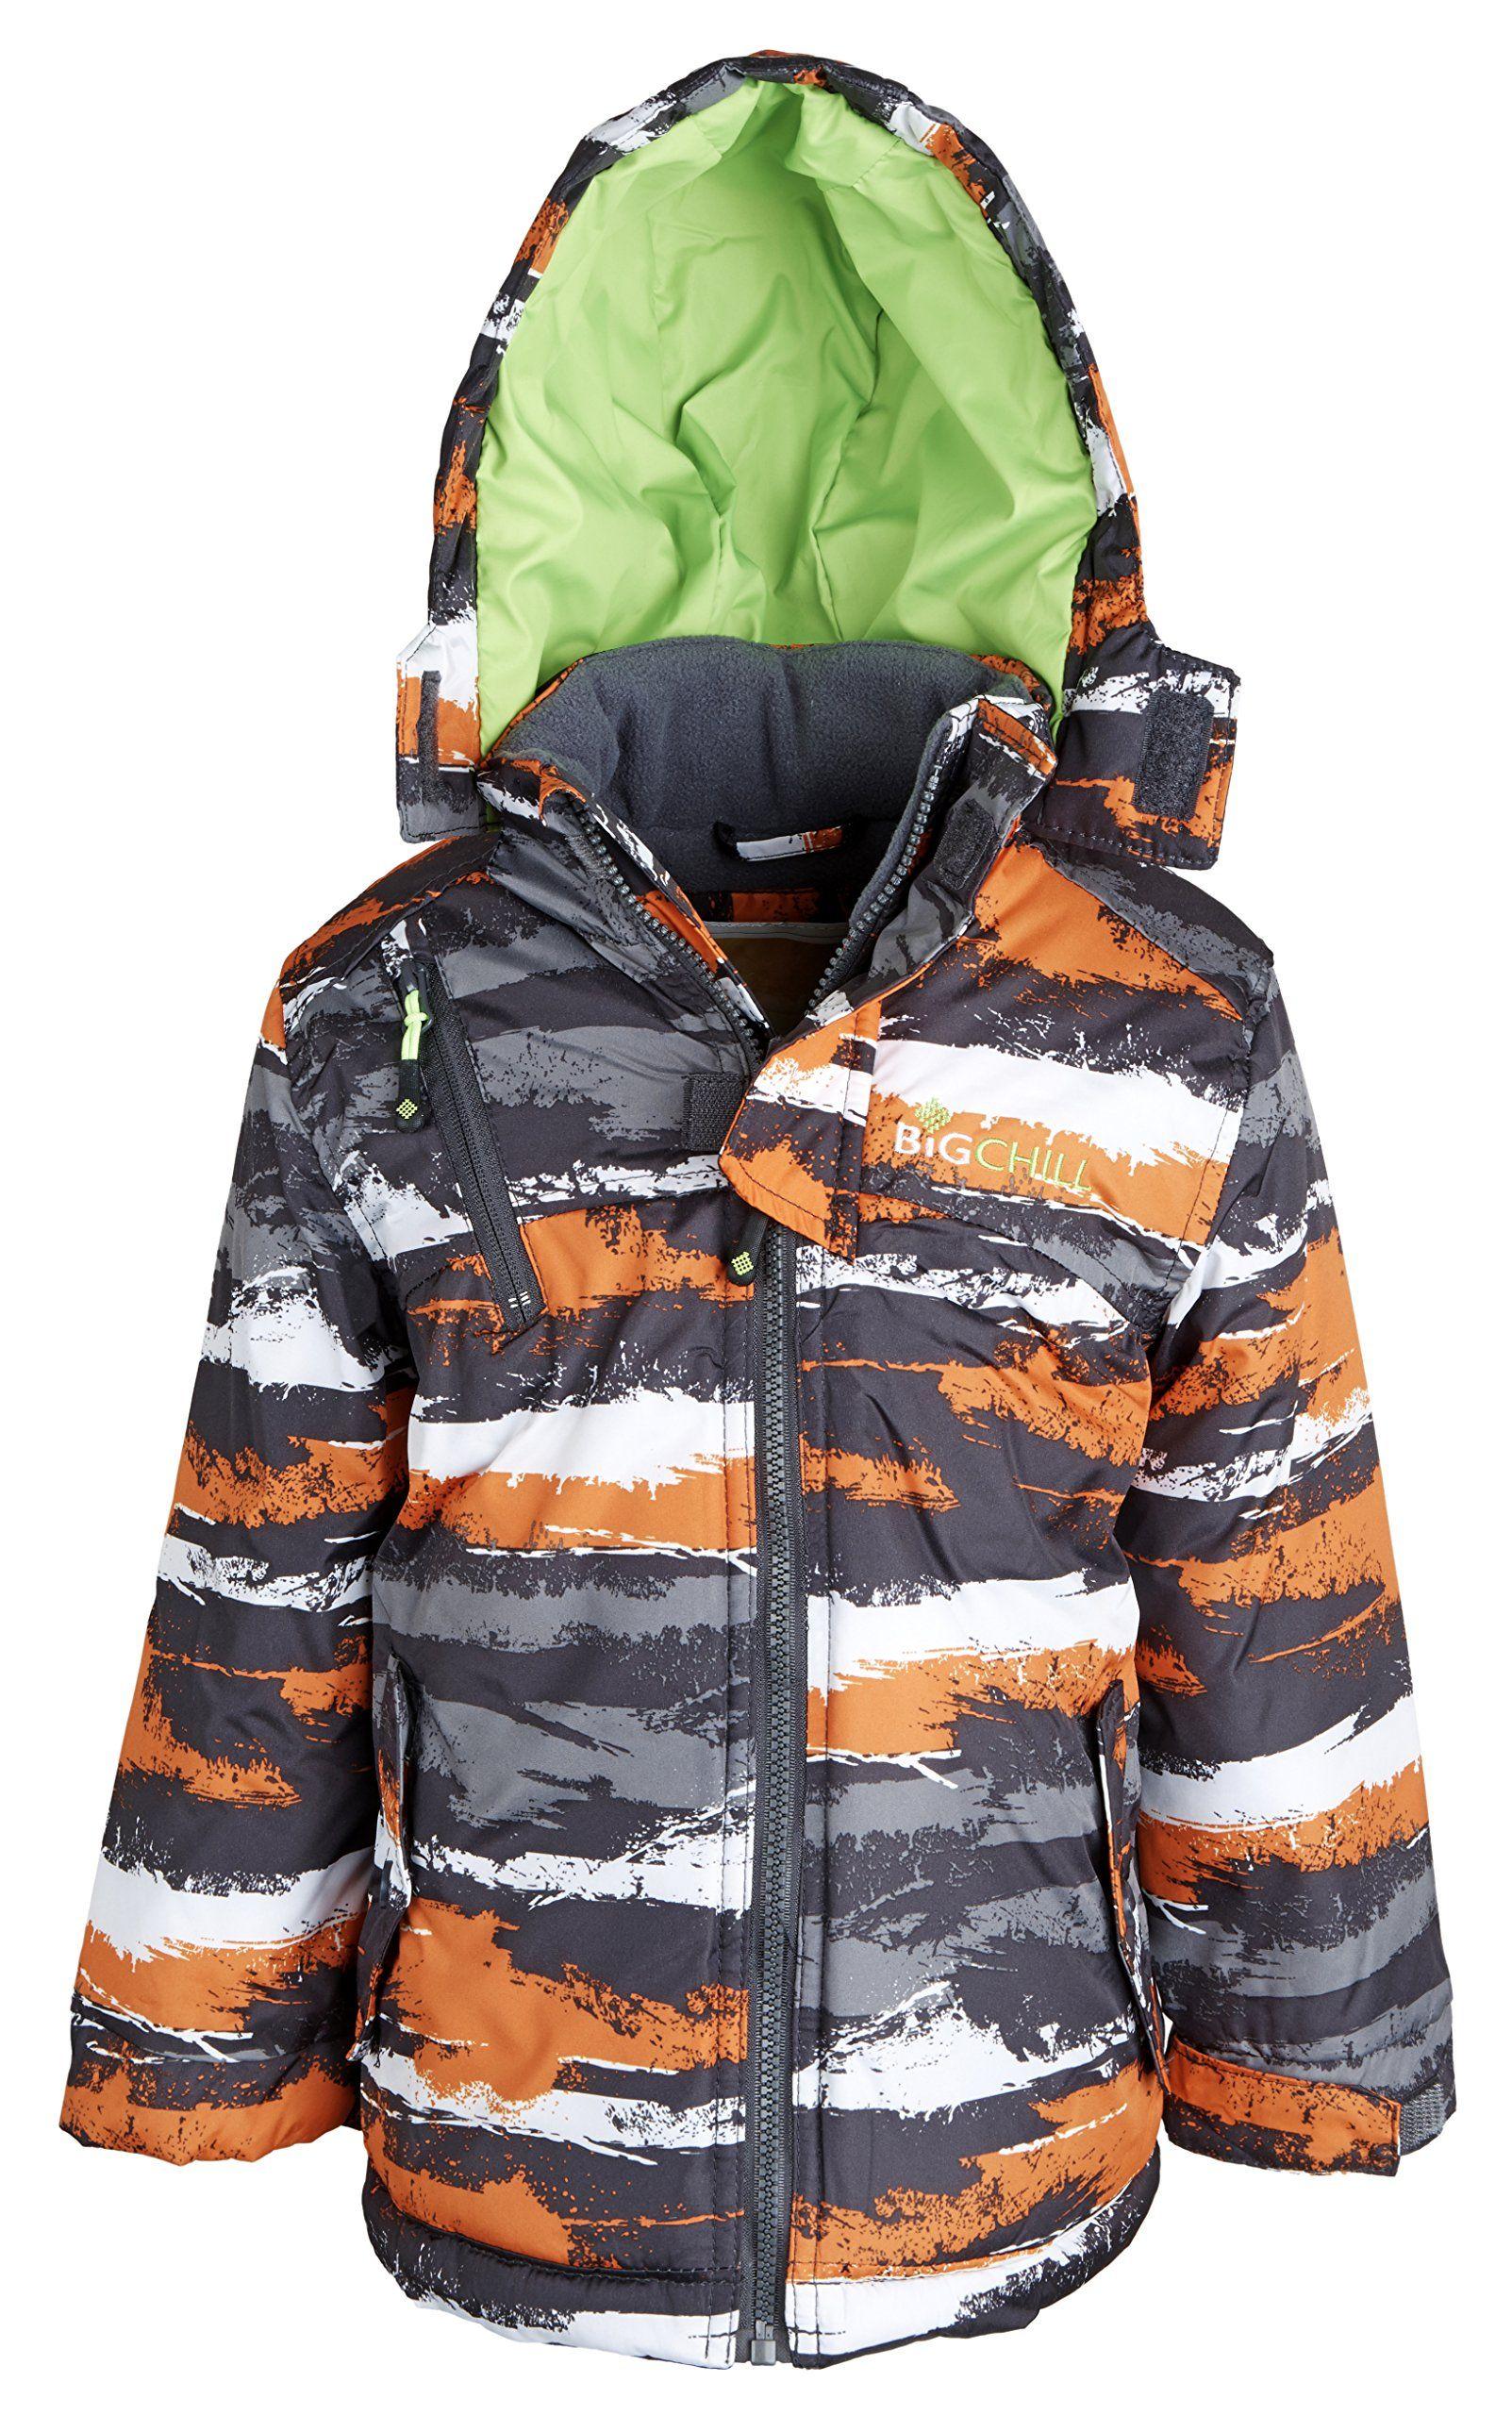 Big Chill Little Boys Insulated Down Alternative Fleece Lined Puffer Camo Jacket Charcoal 4 Camo Design Camo Jacket Long Winter Jacket Girls Winter Coats [ 2560 x 1603 Pixel ]